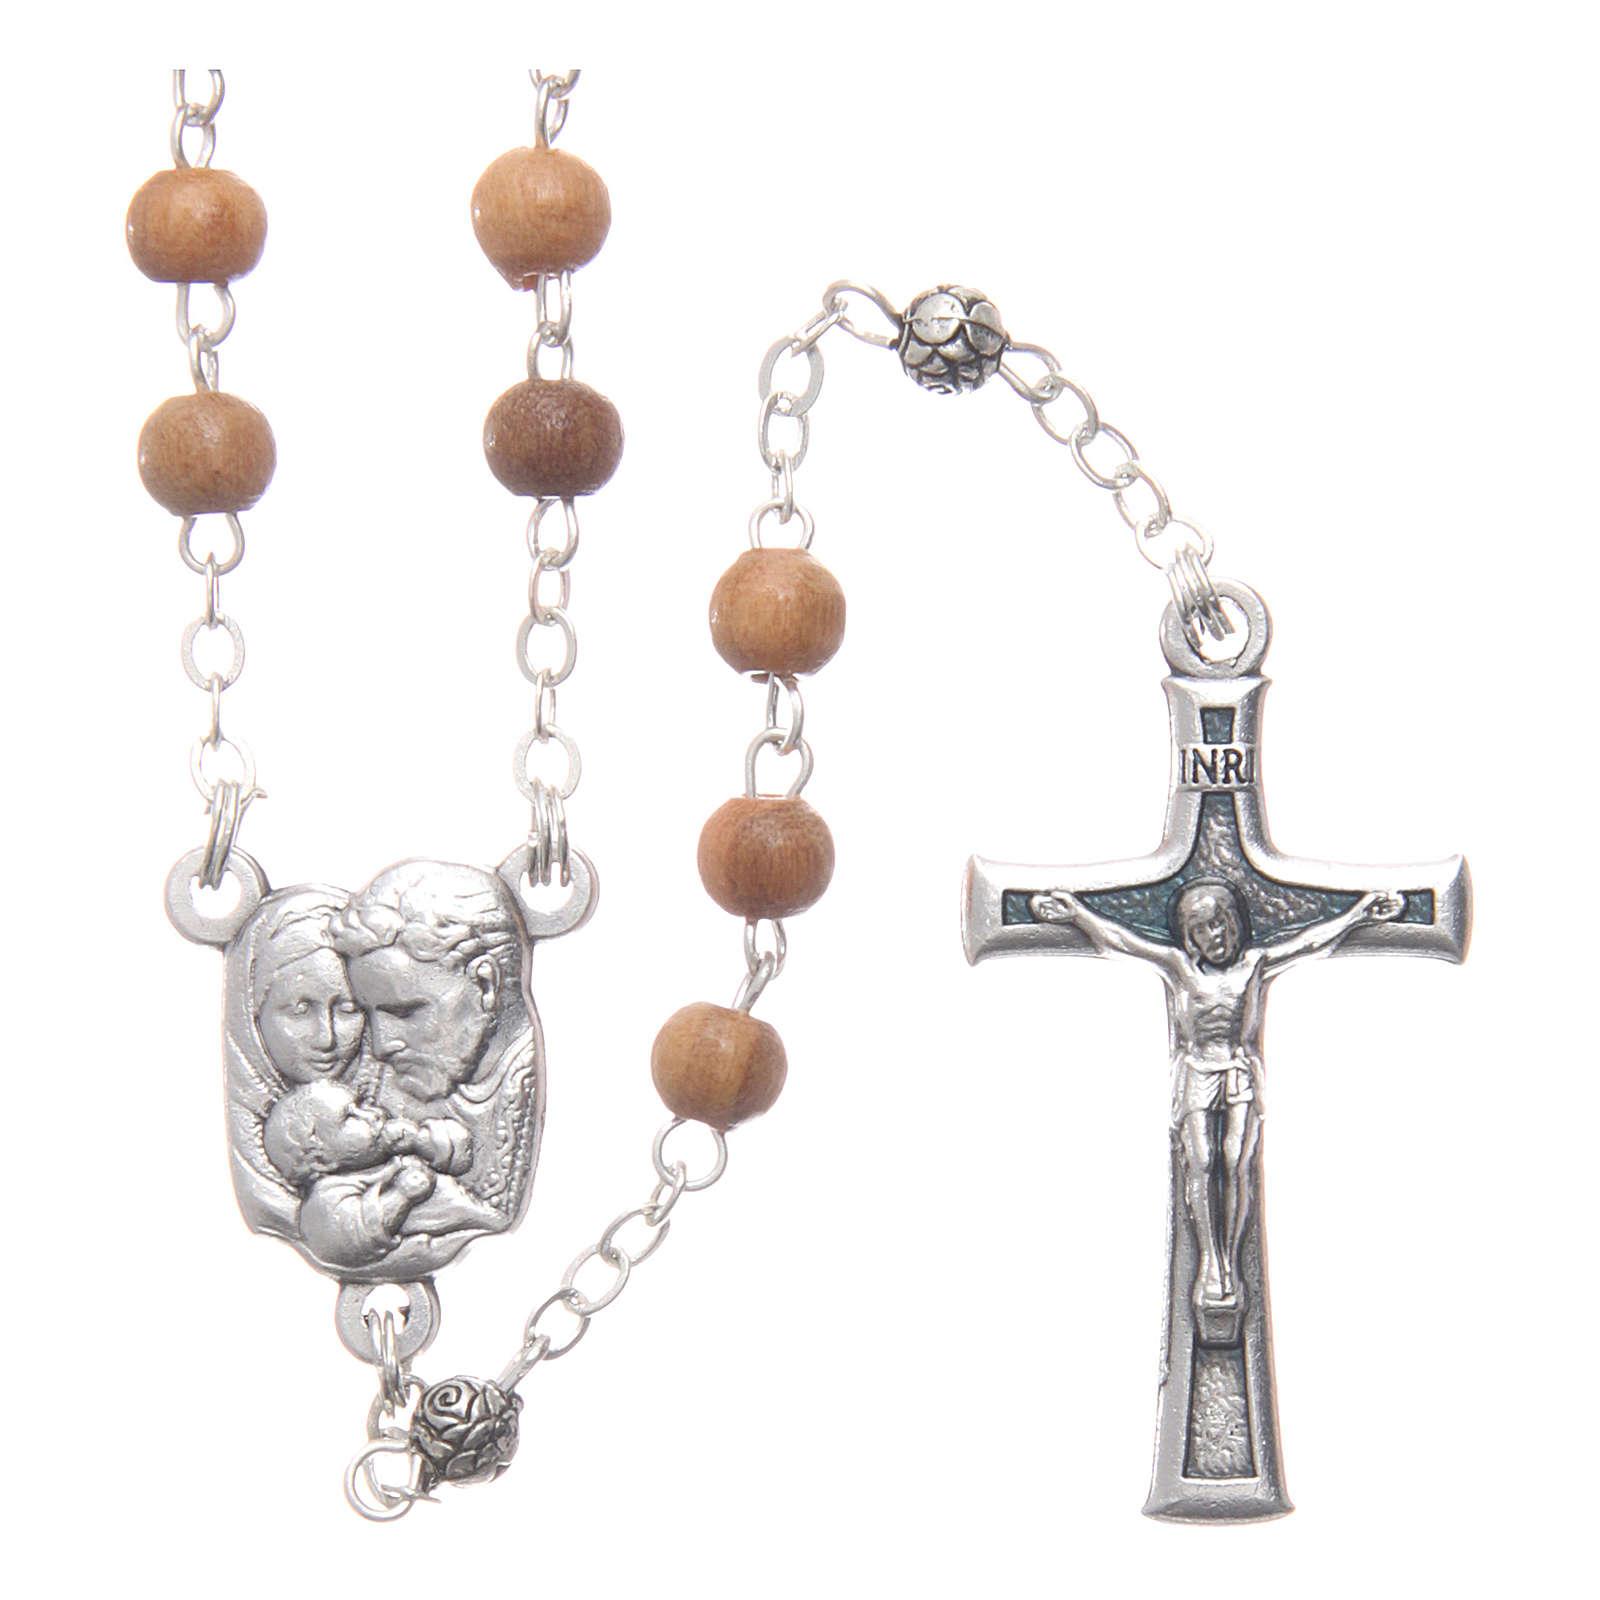 Boîte en olivier image Sainte Famille avec chapelet en bois 5 mm 4